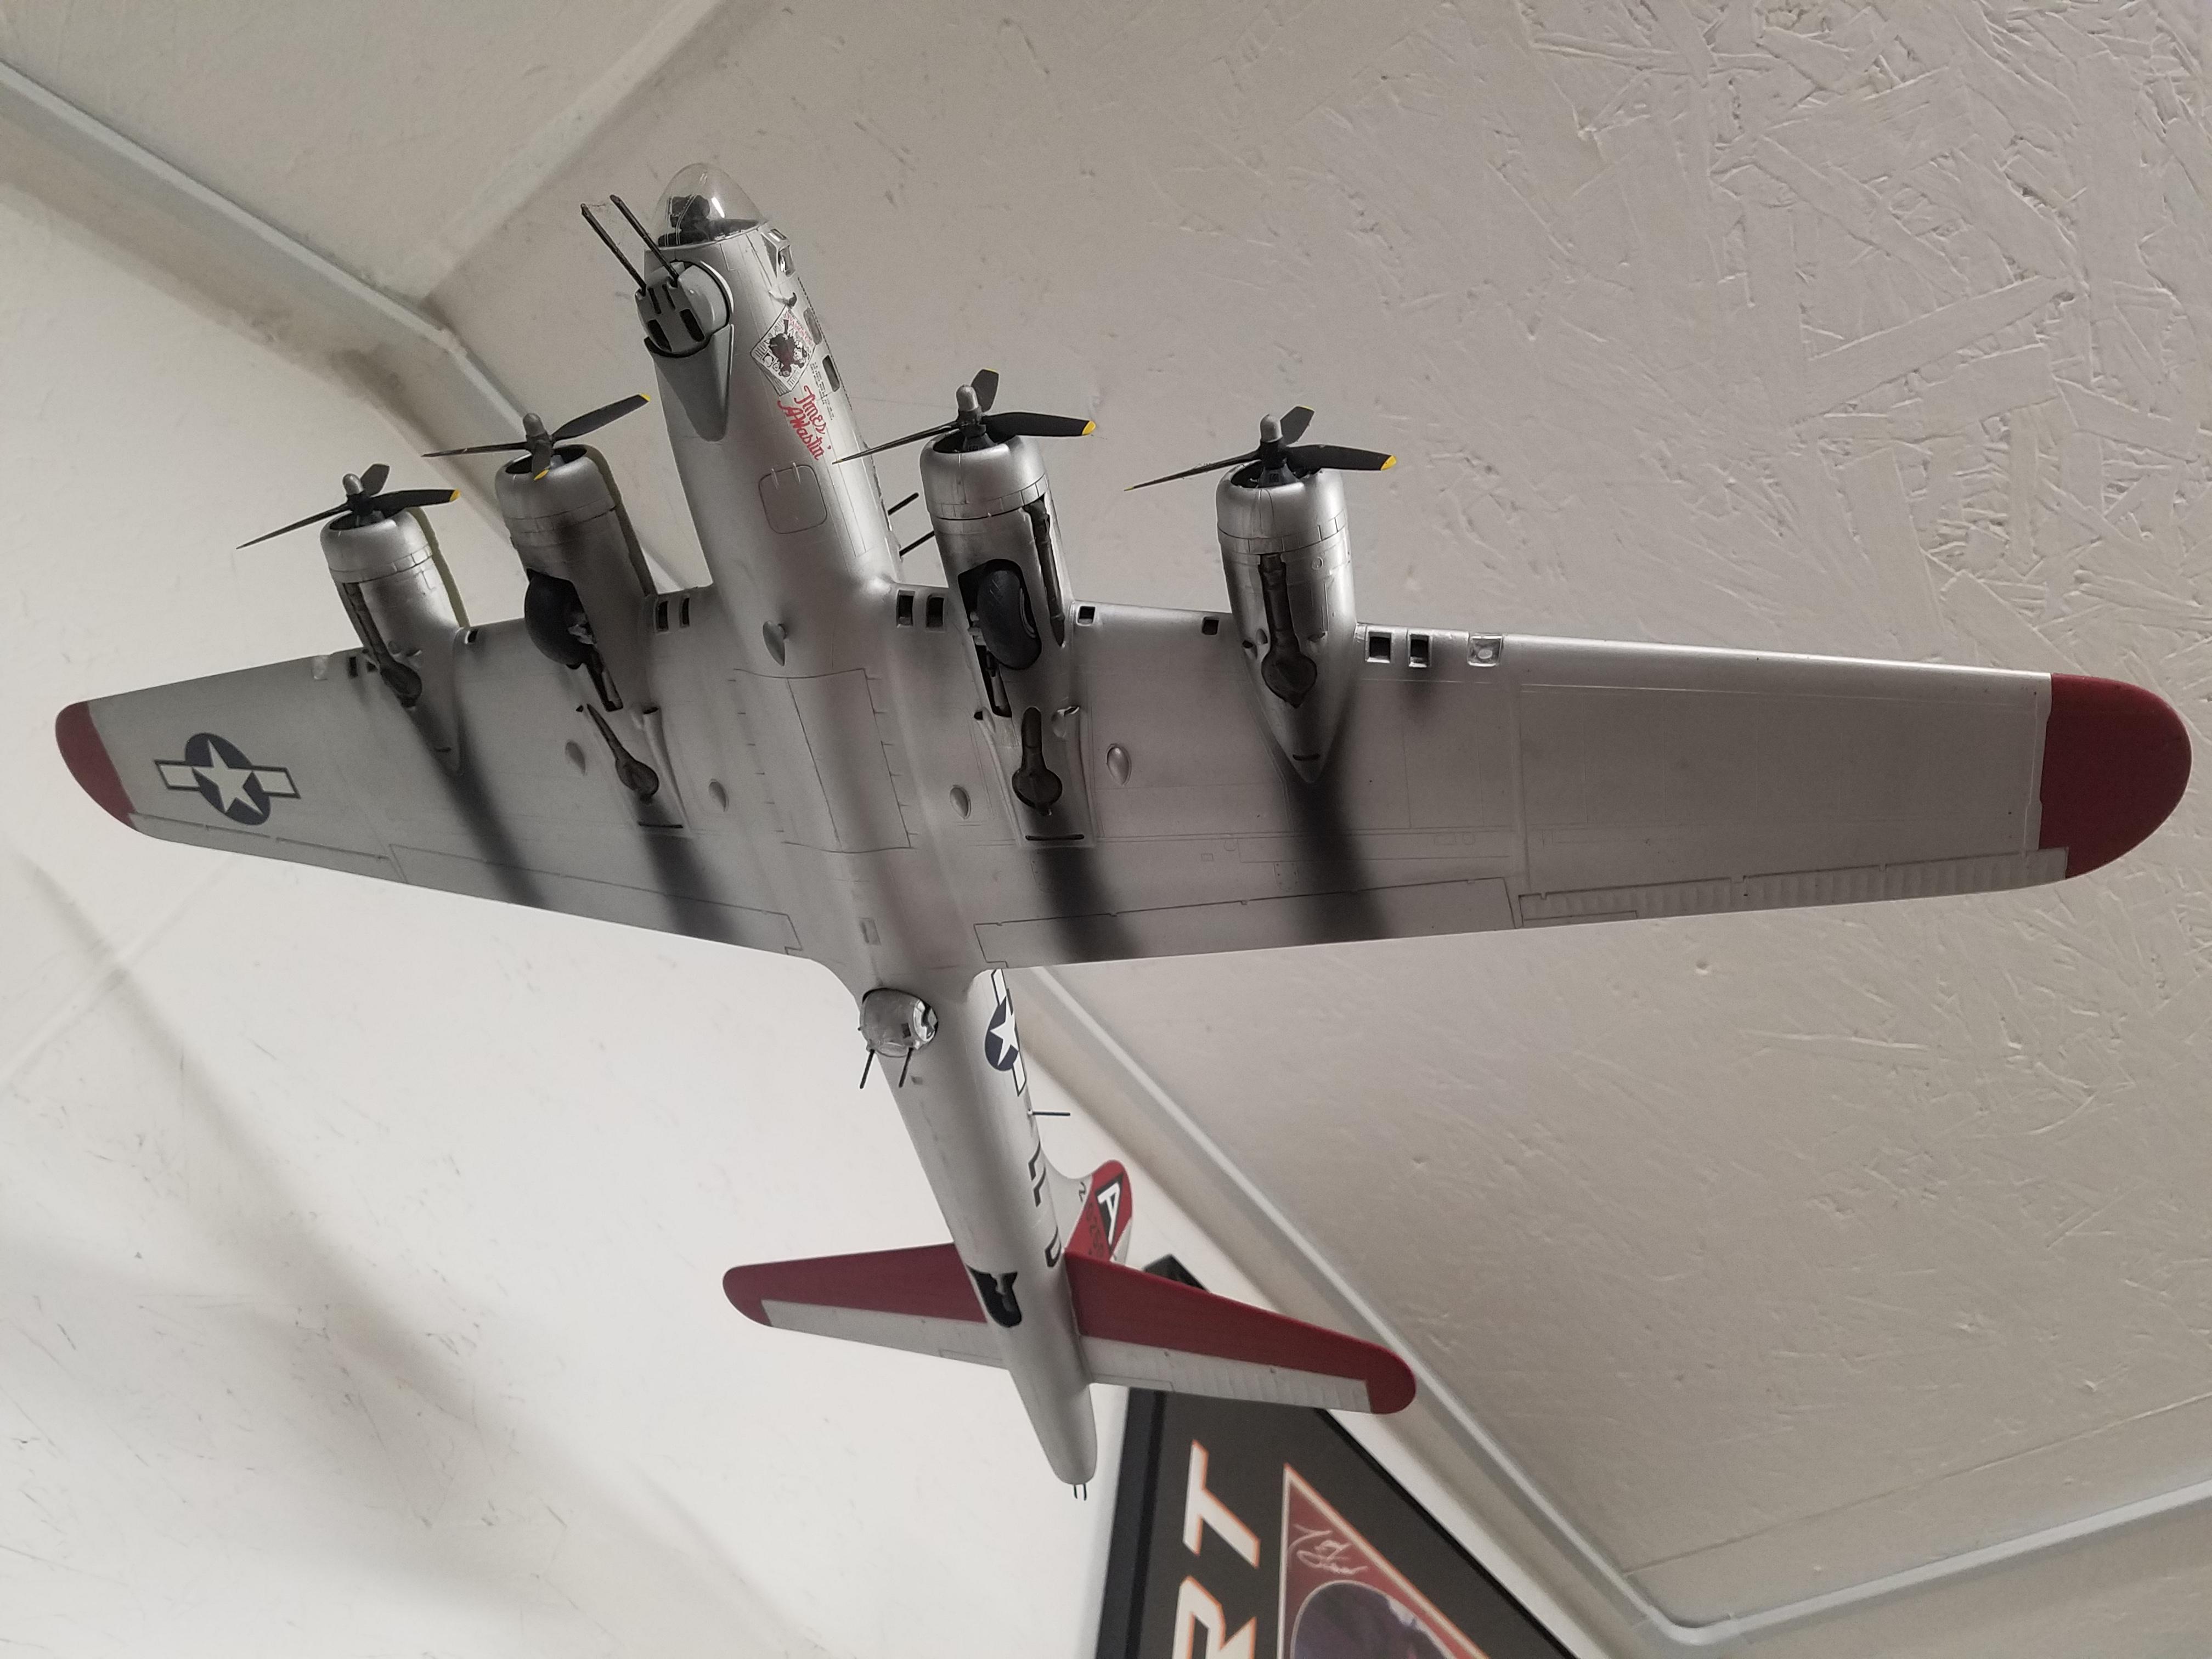 b-17 underside.jpg